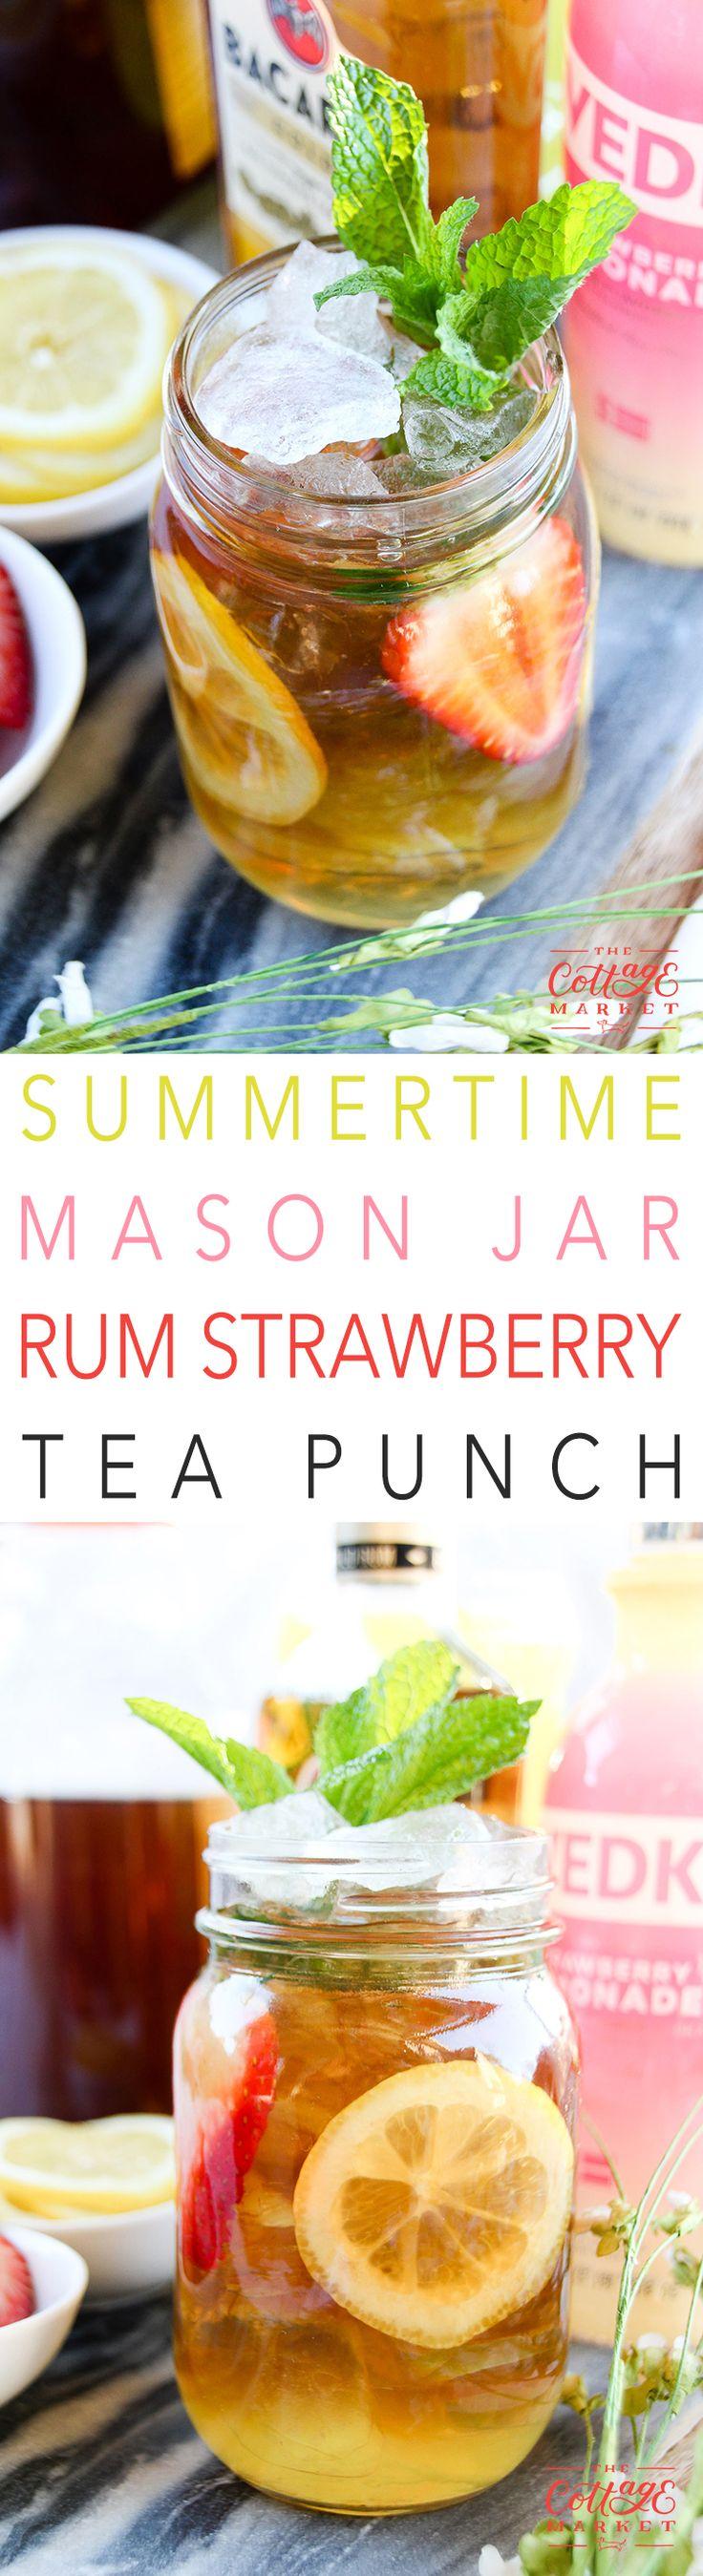 Summertime Mason Jar Strawberry Rum Tea Punch - The Cottage Market